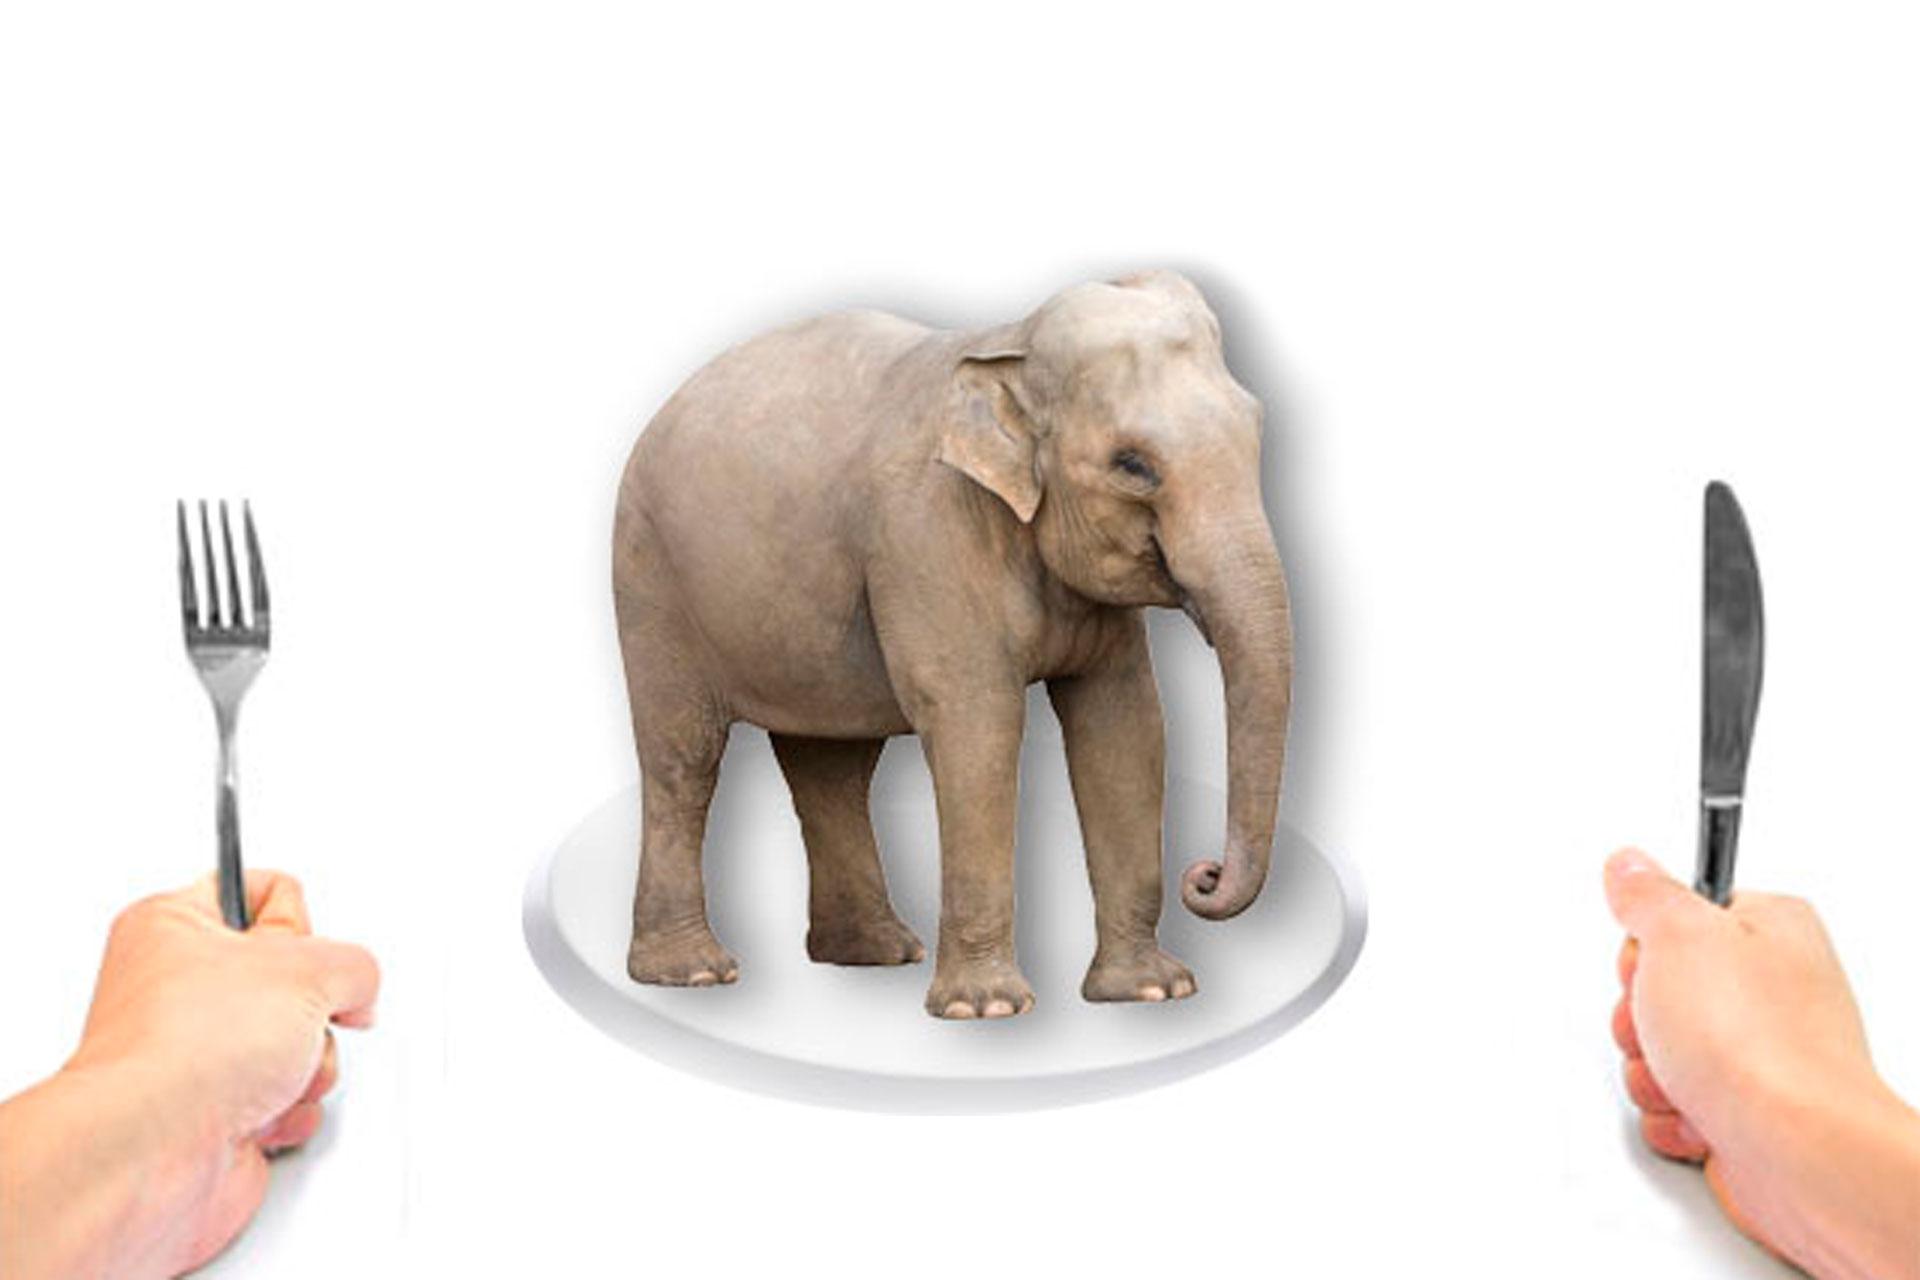 eating an elephant